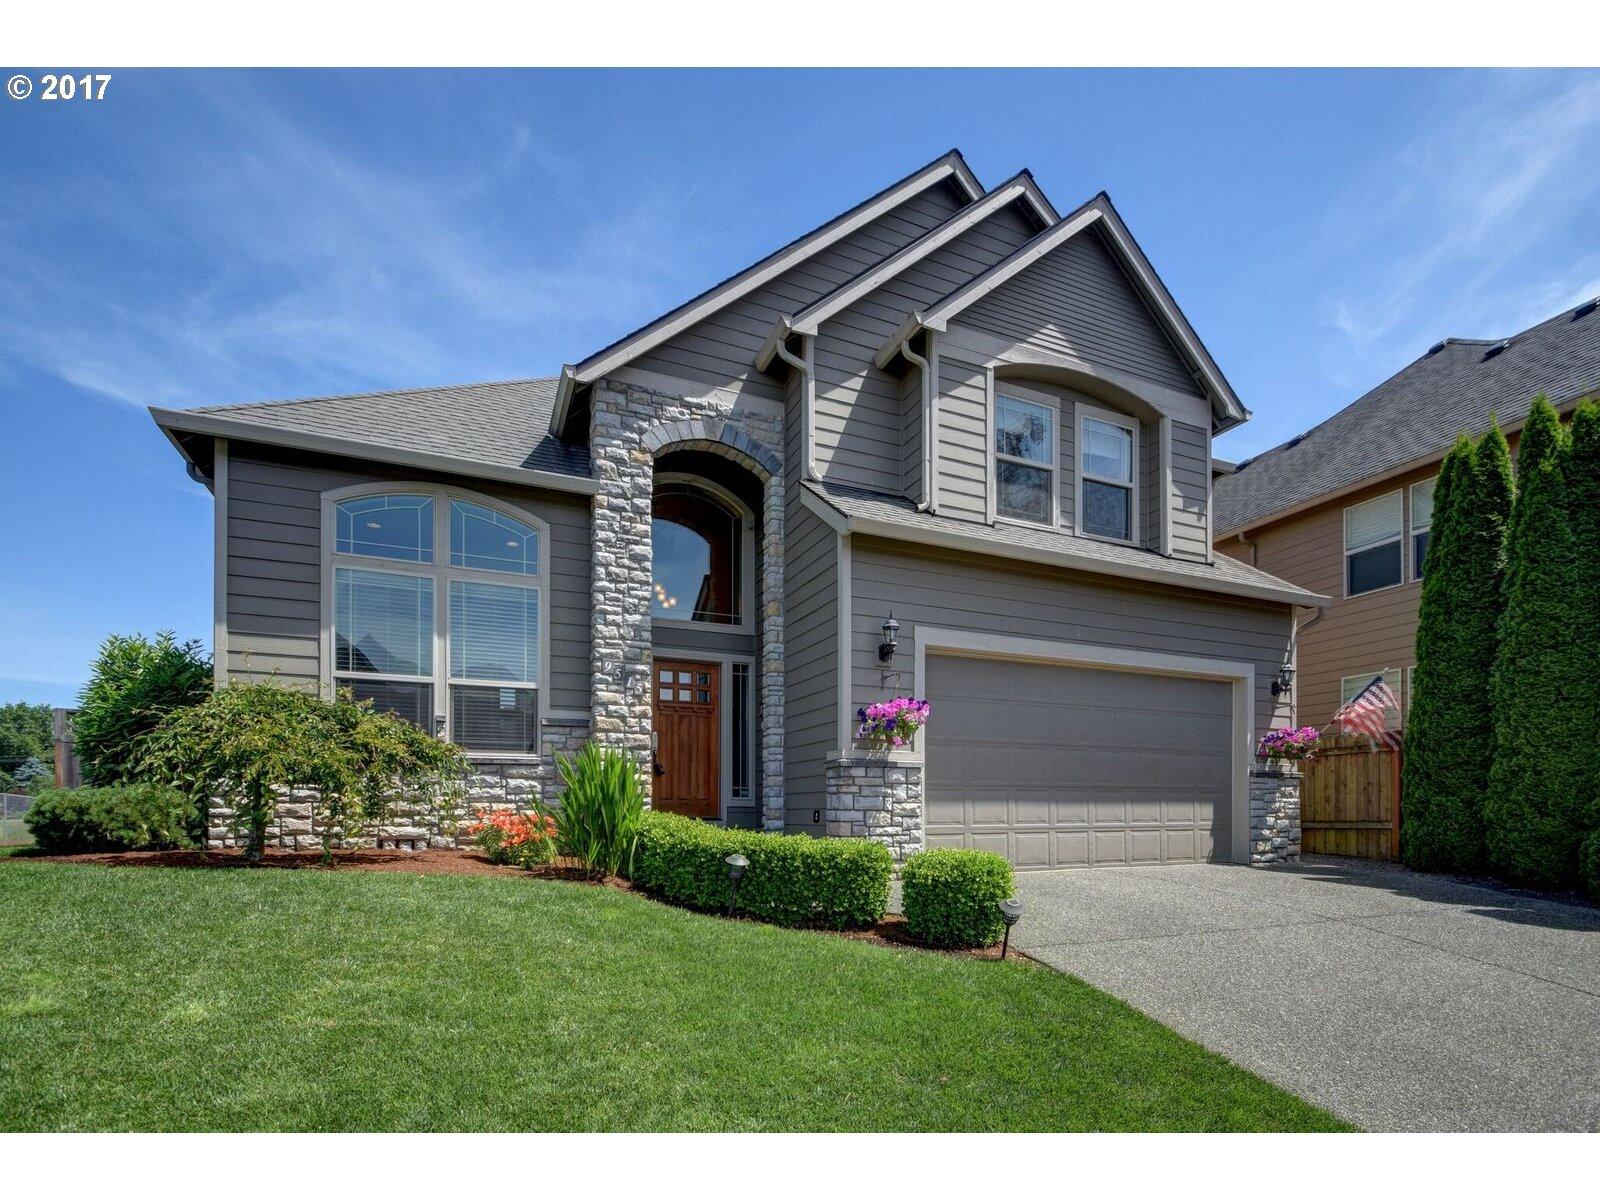 9515 NW 23RD CT, Vancouver, WA 98665